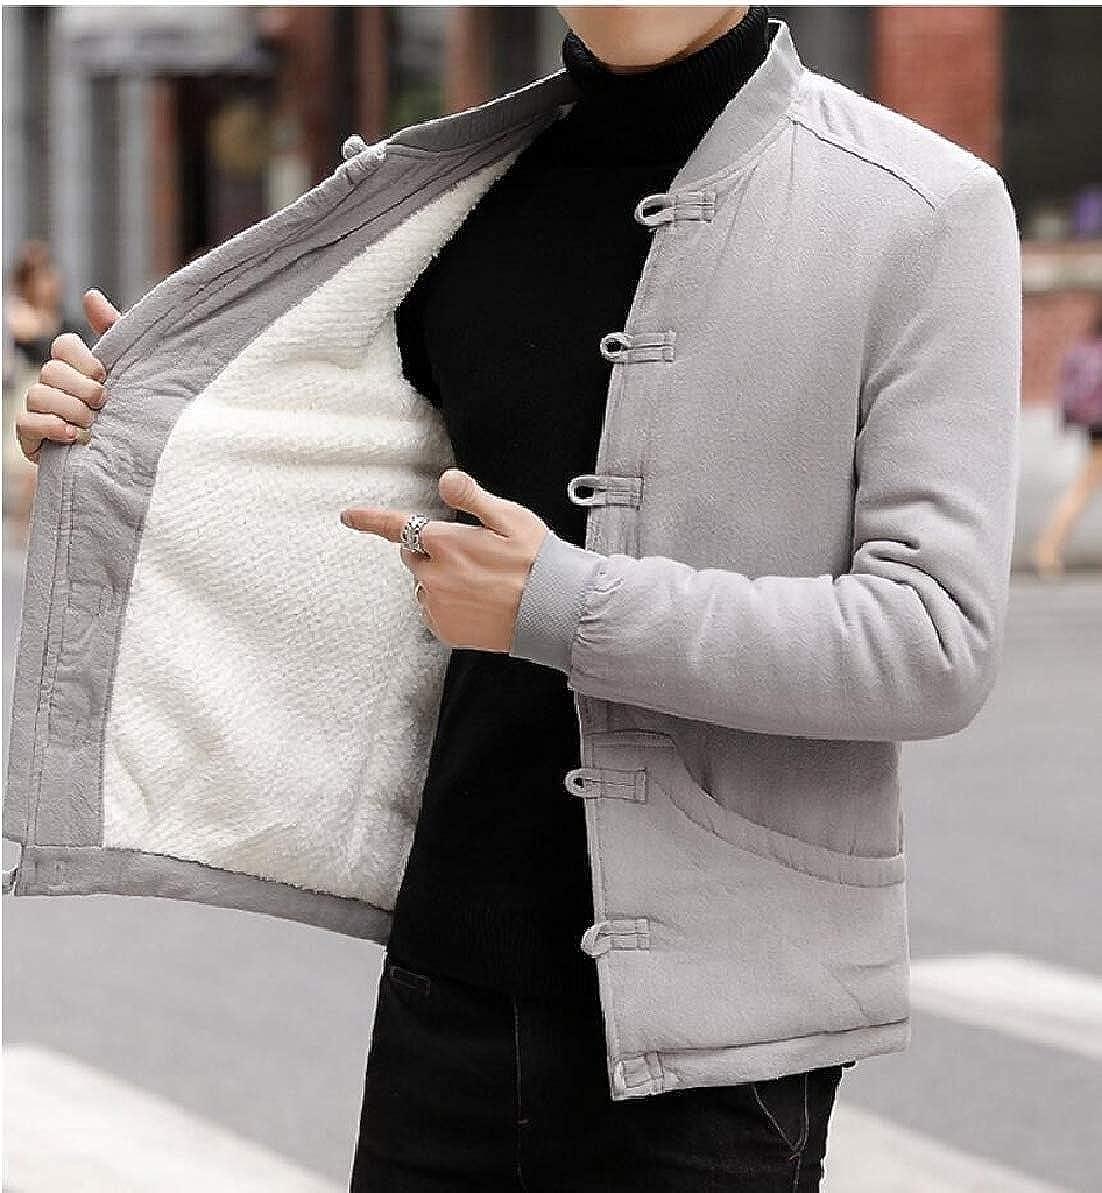 FLCH+YIGE Men Casual Fleece Lined Jacket Cotton Linen Button Down Thick Warm Coat